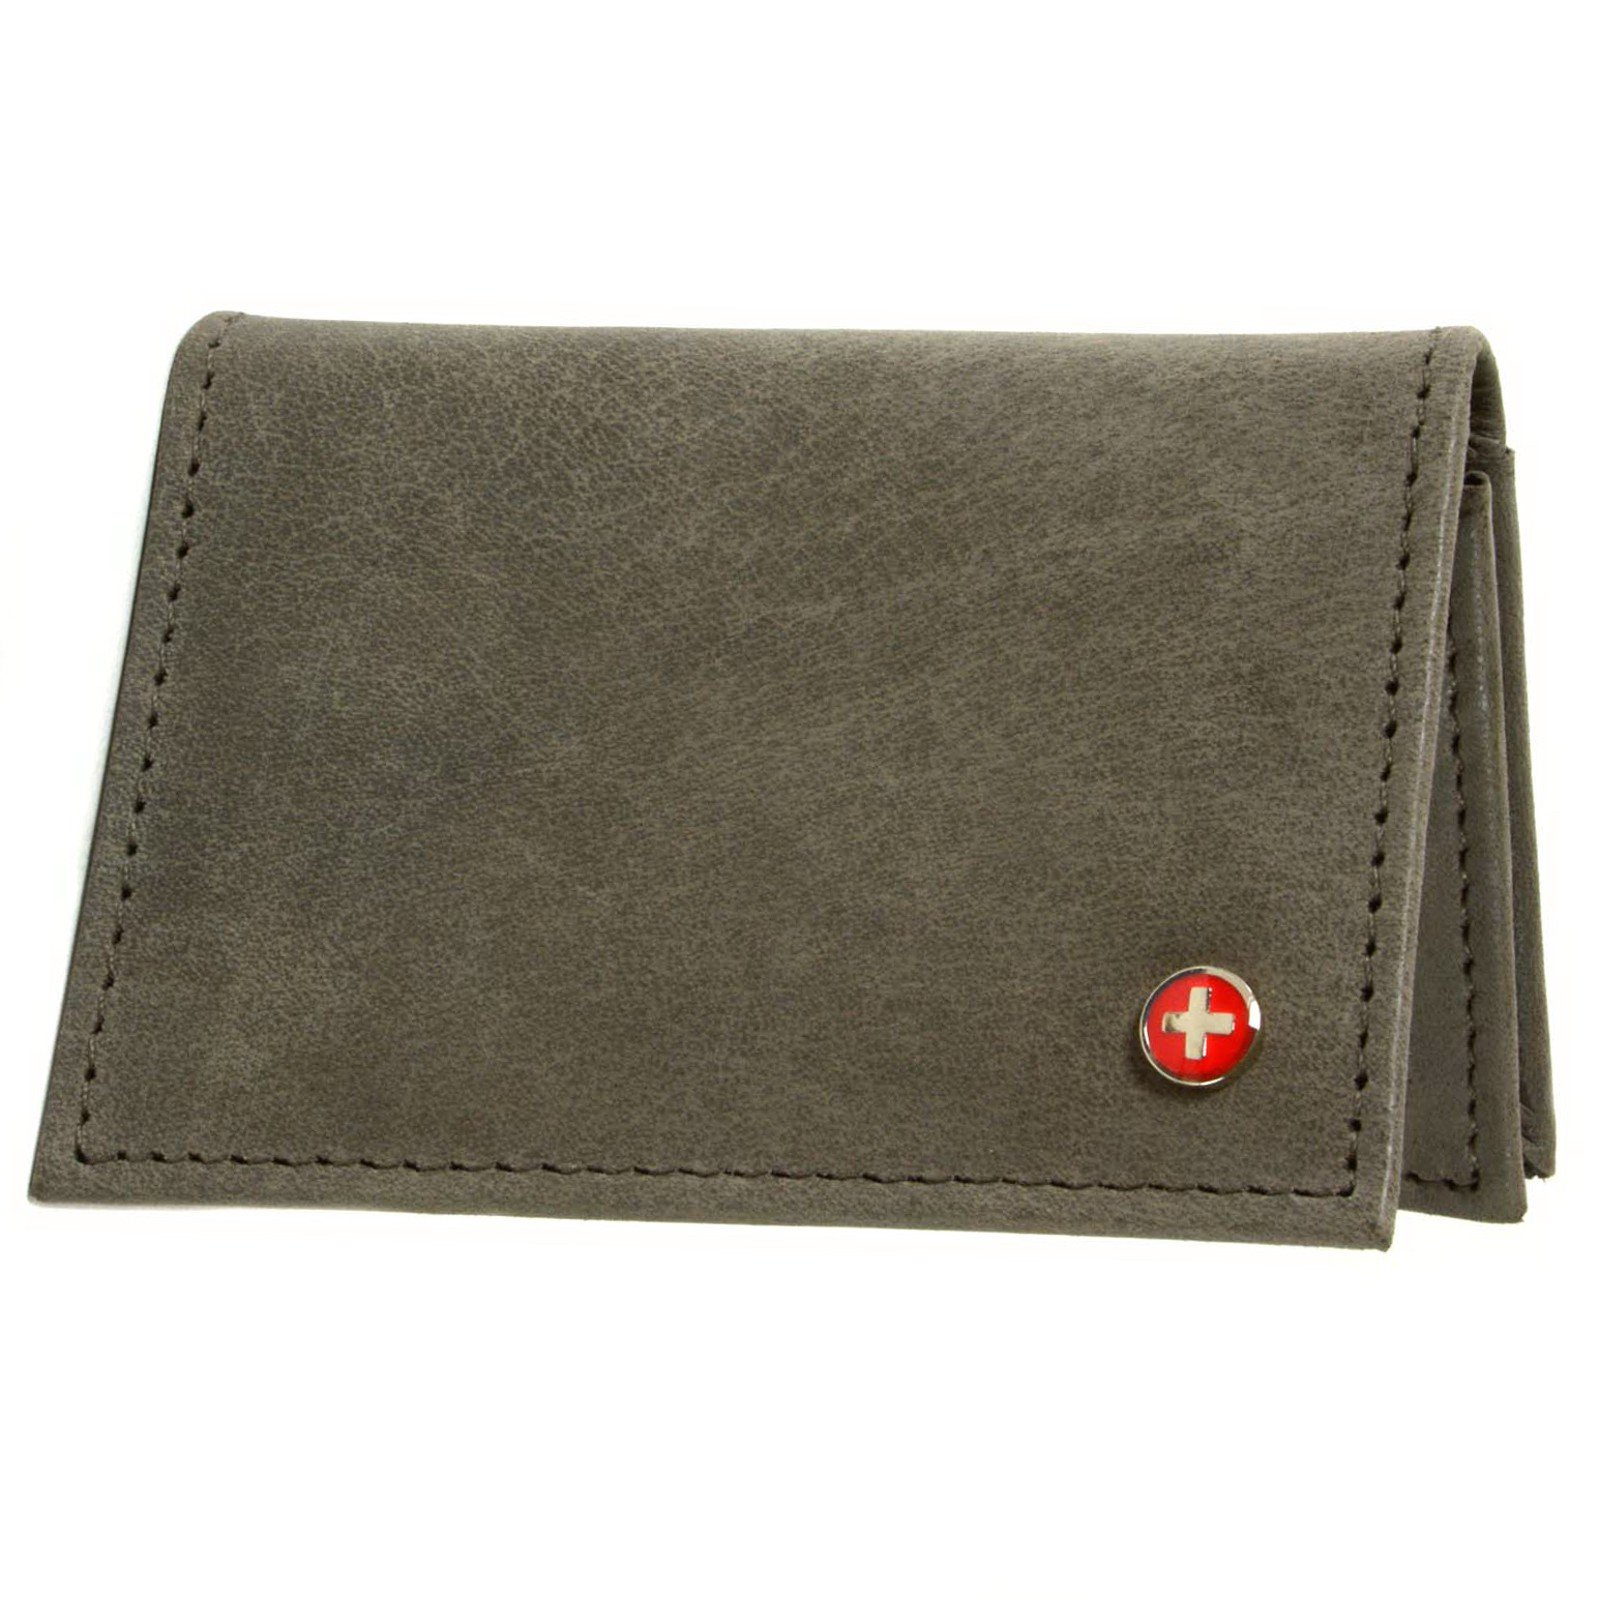 Alpine Swiss Genuine Leather Thin Business Card Case Minimalist Wallet Gray